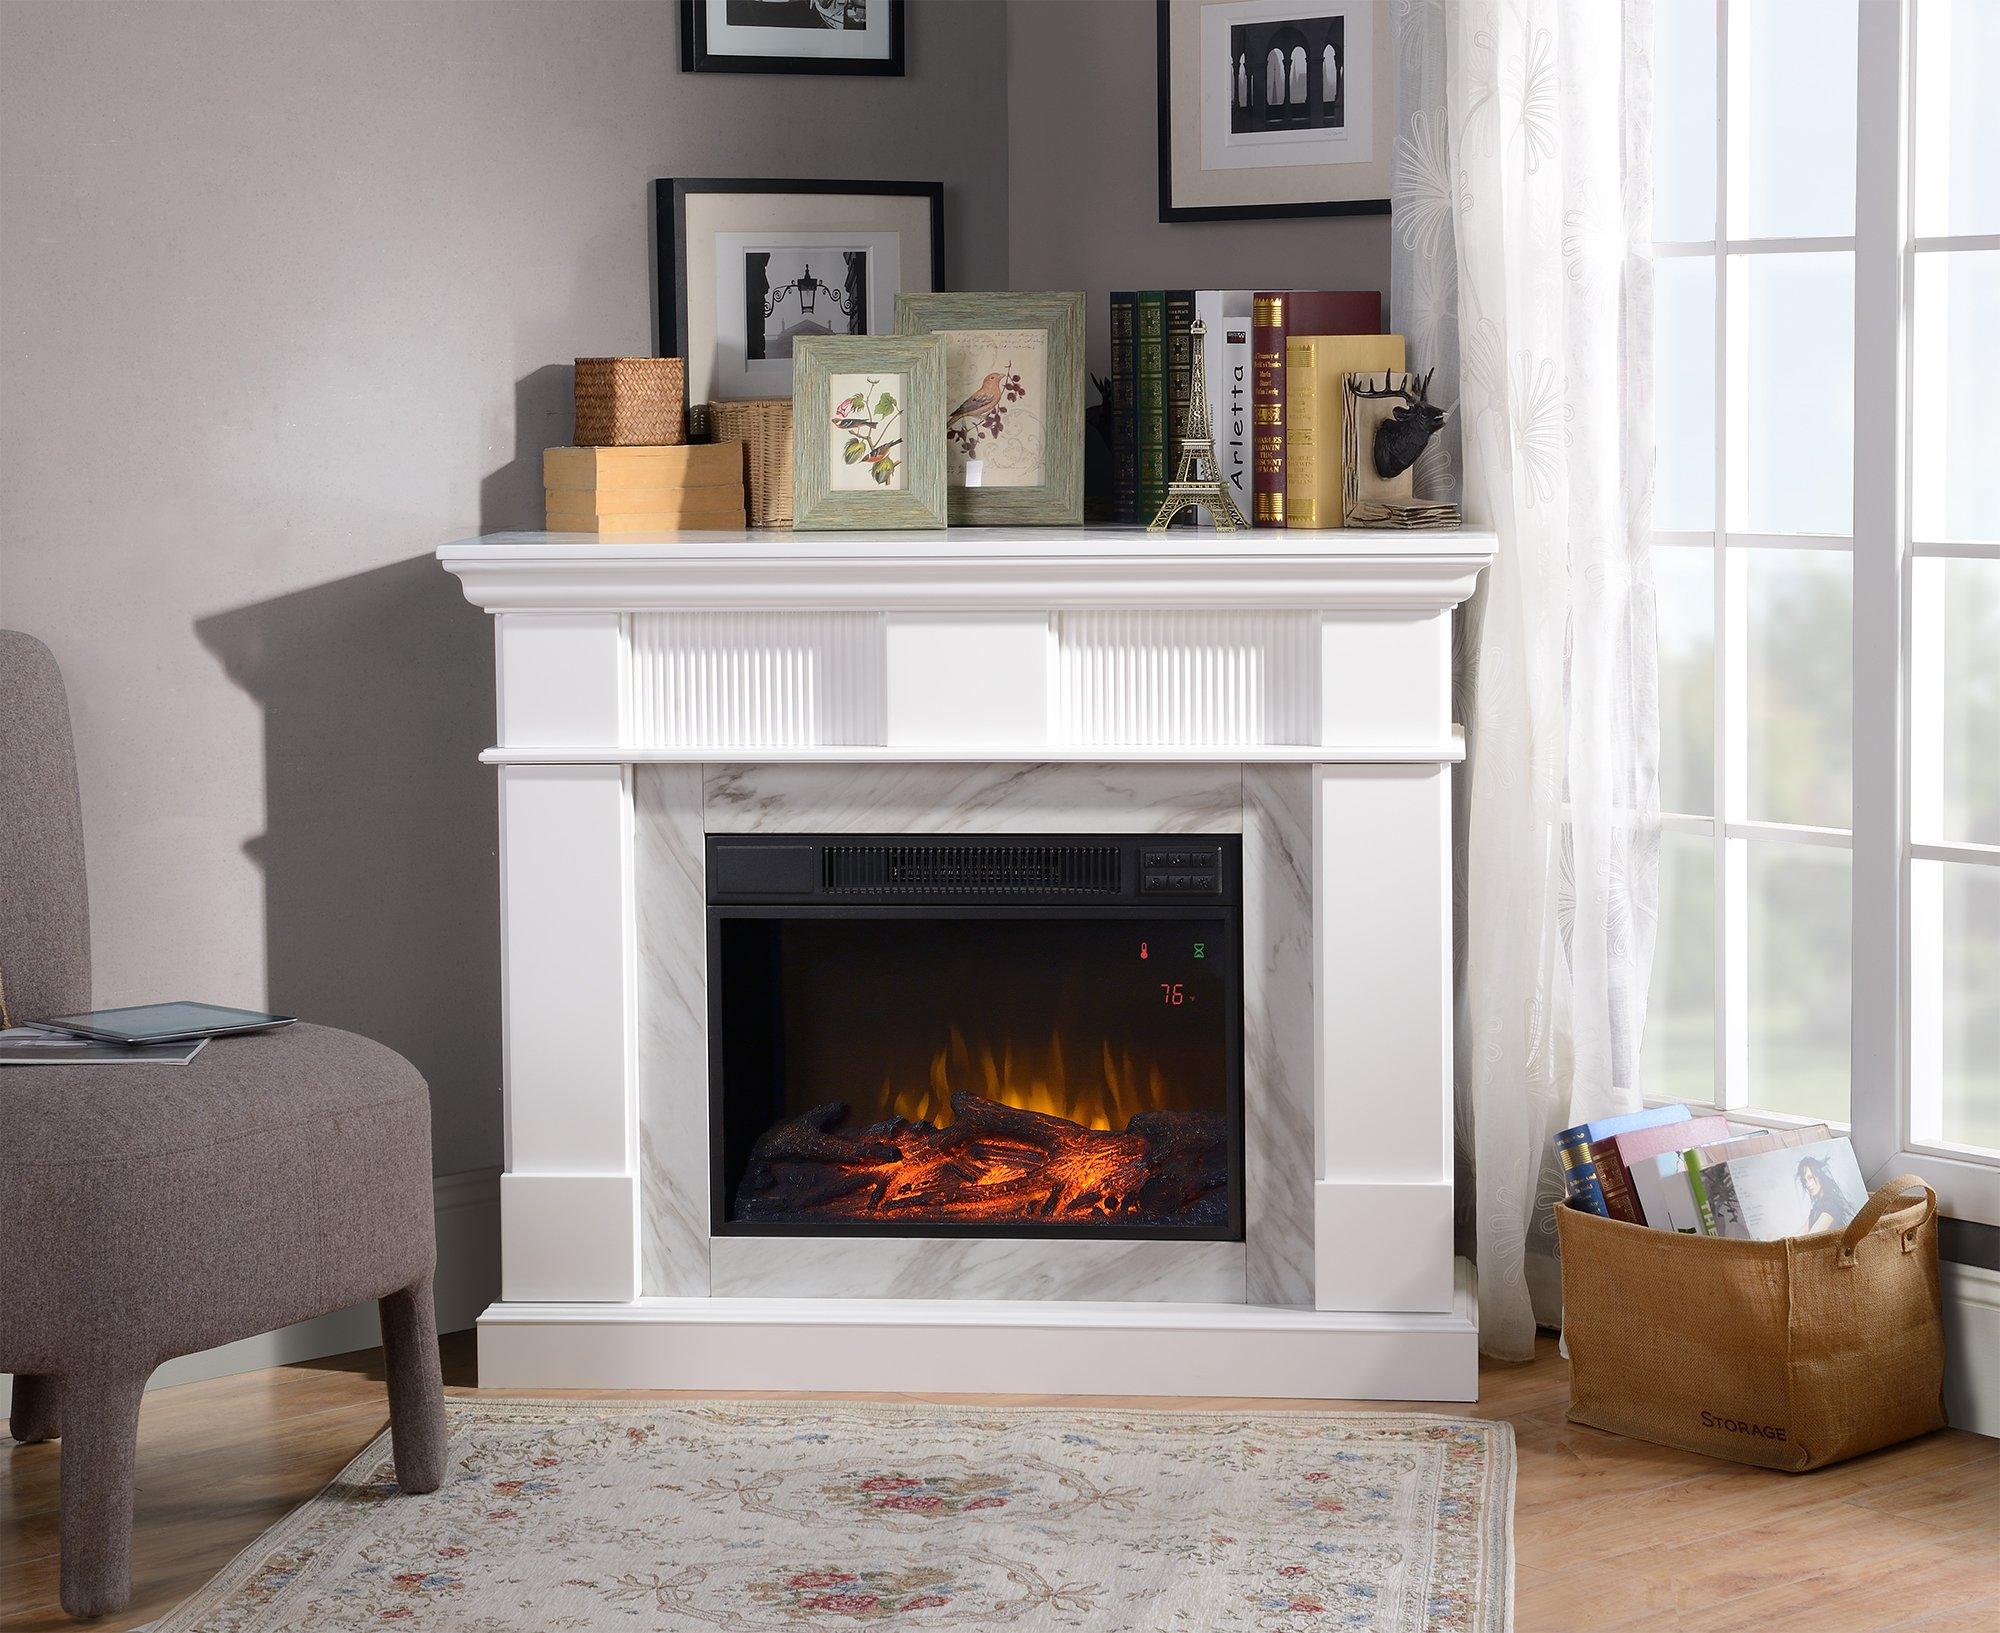 corner fireplace mantel amazon com rh amazon com corner fireplace mantel design ideas corner fireplace mantel decorating ideas